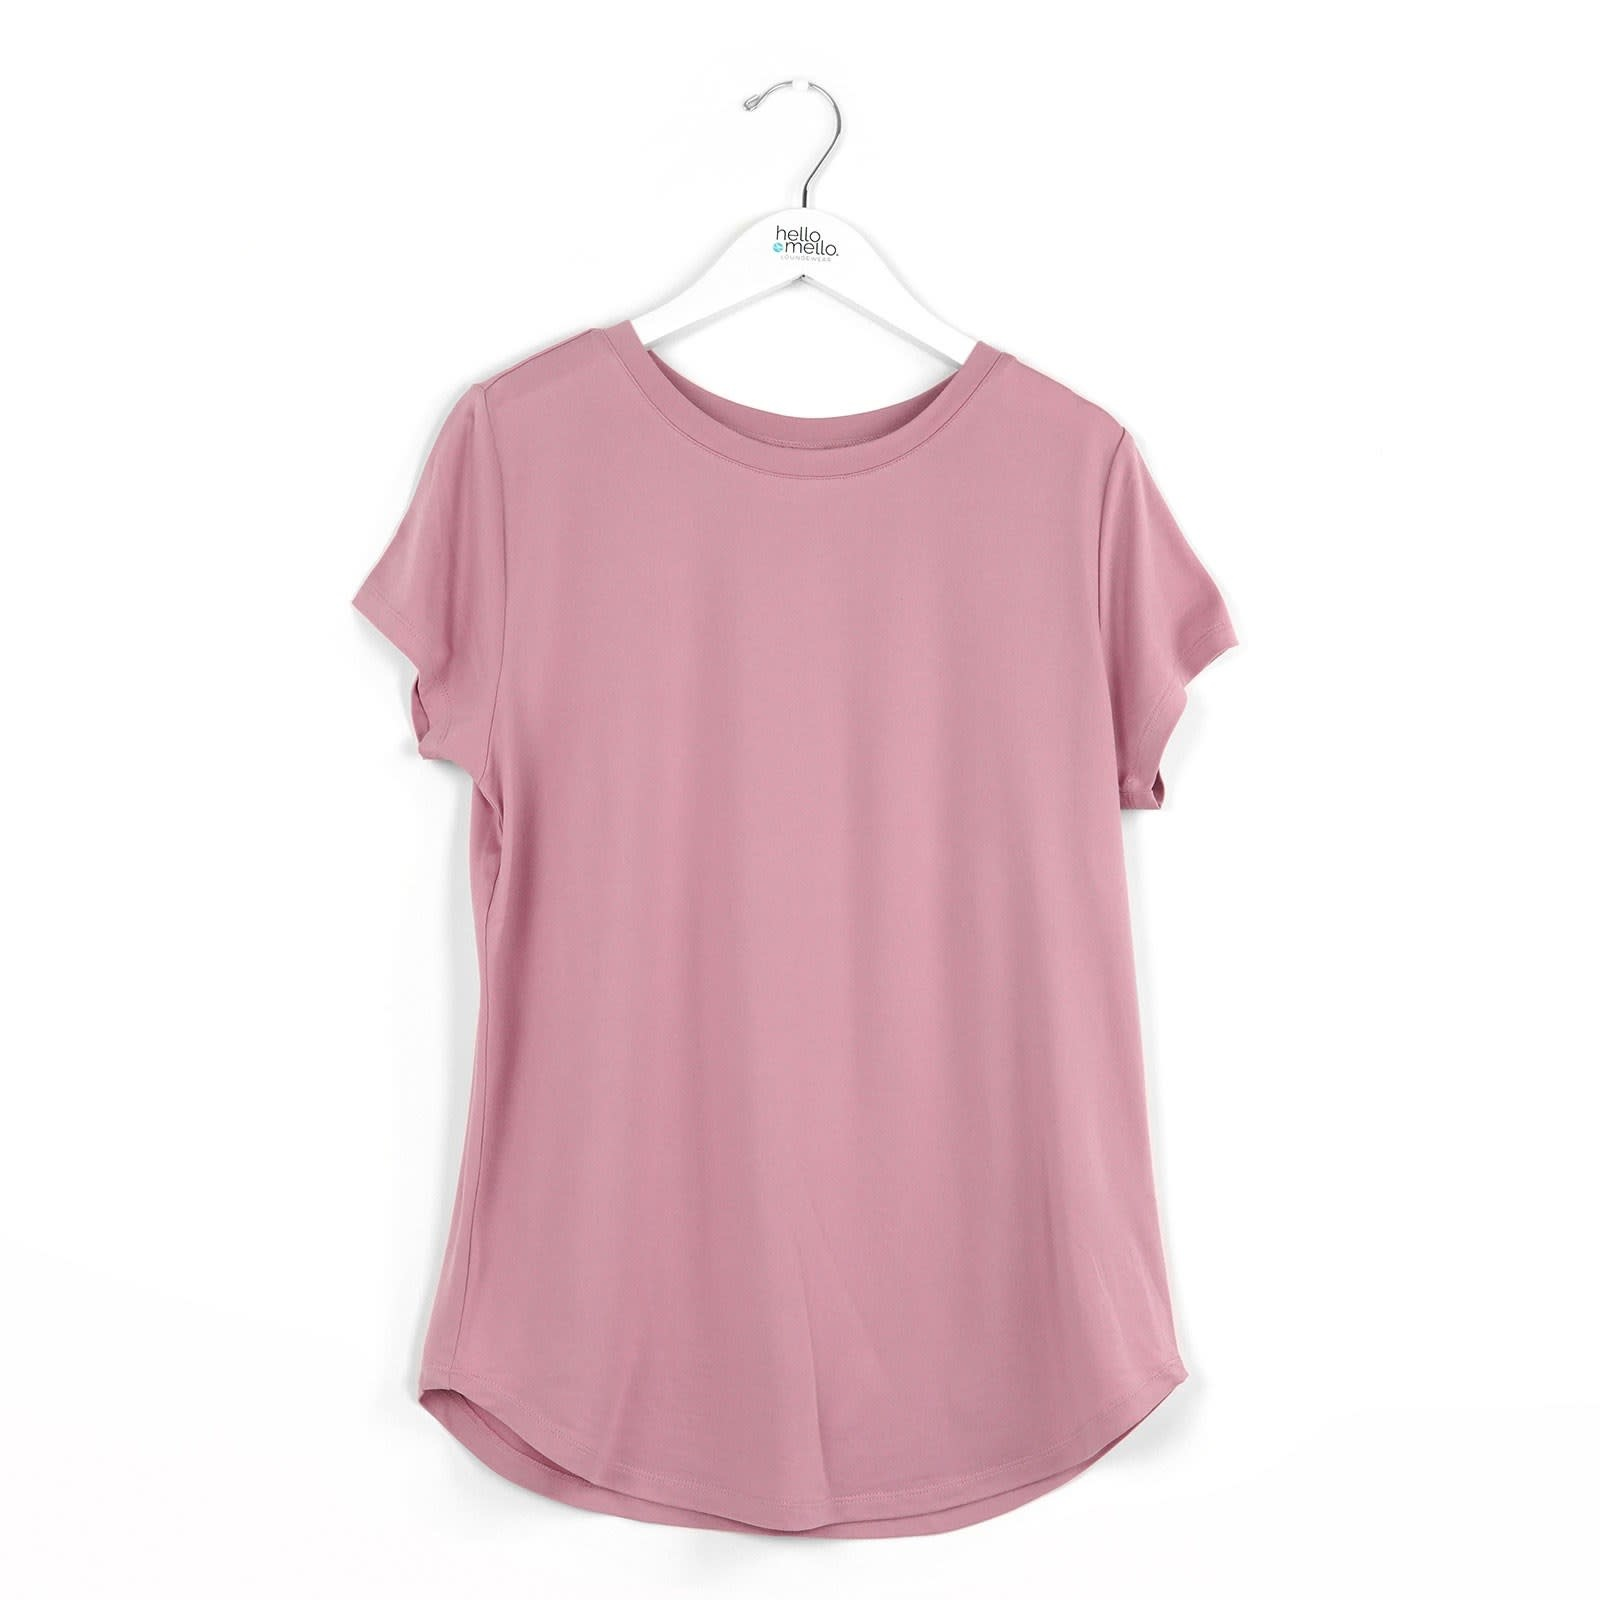 Hello Mello Pink Dream Tee *NEW*